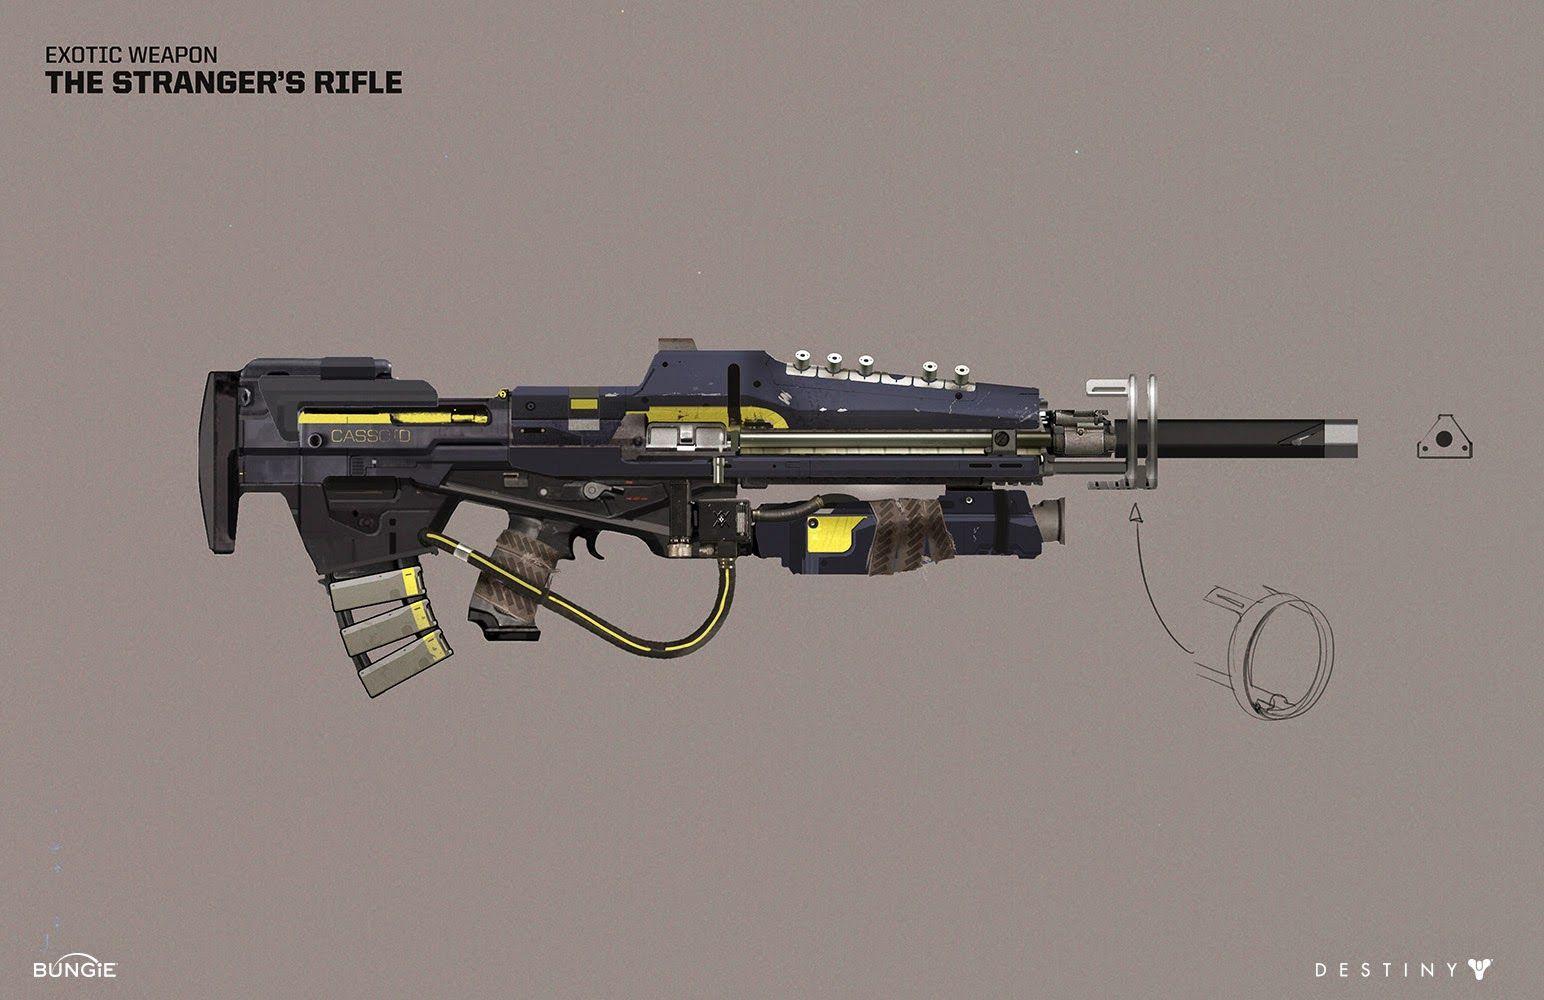 Destiny_Concept_Art_Ryan_DeMita_04.jpg (1544×1000)